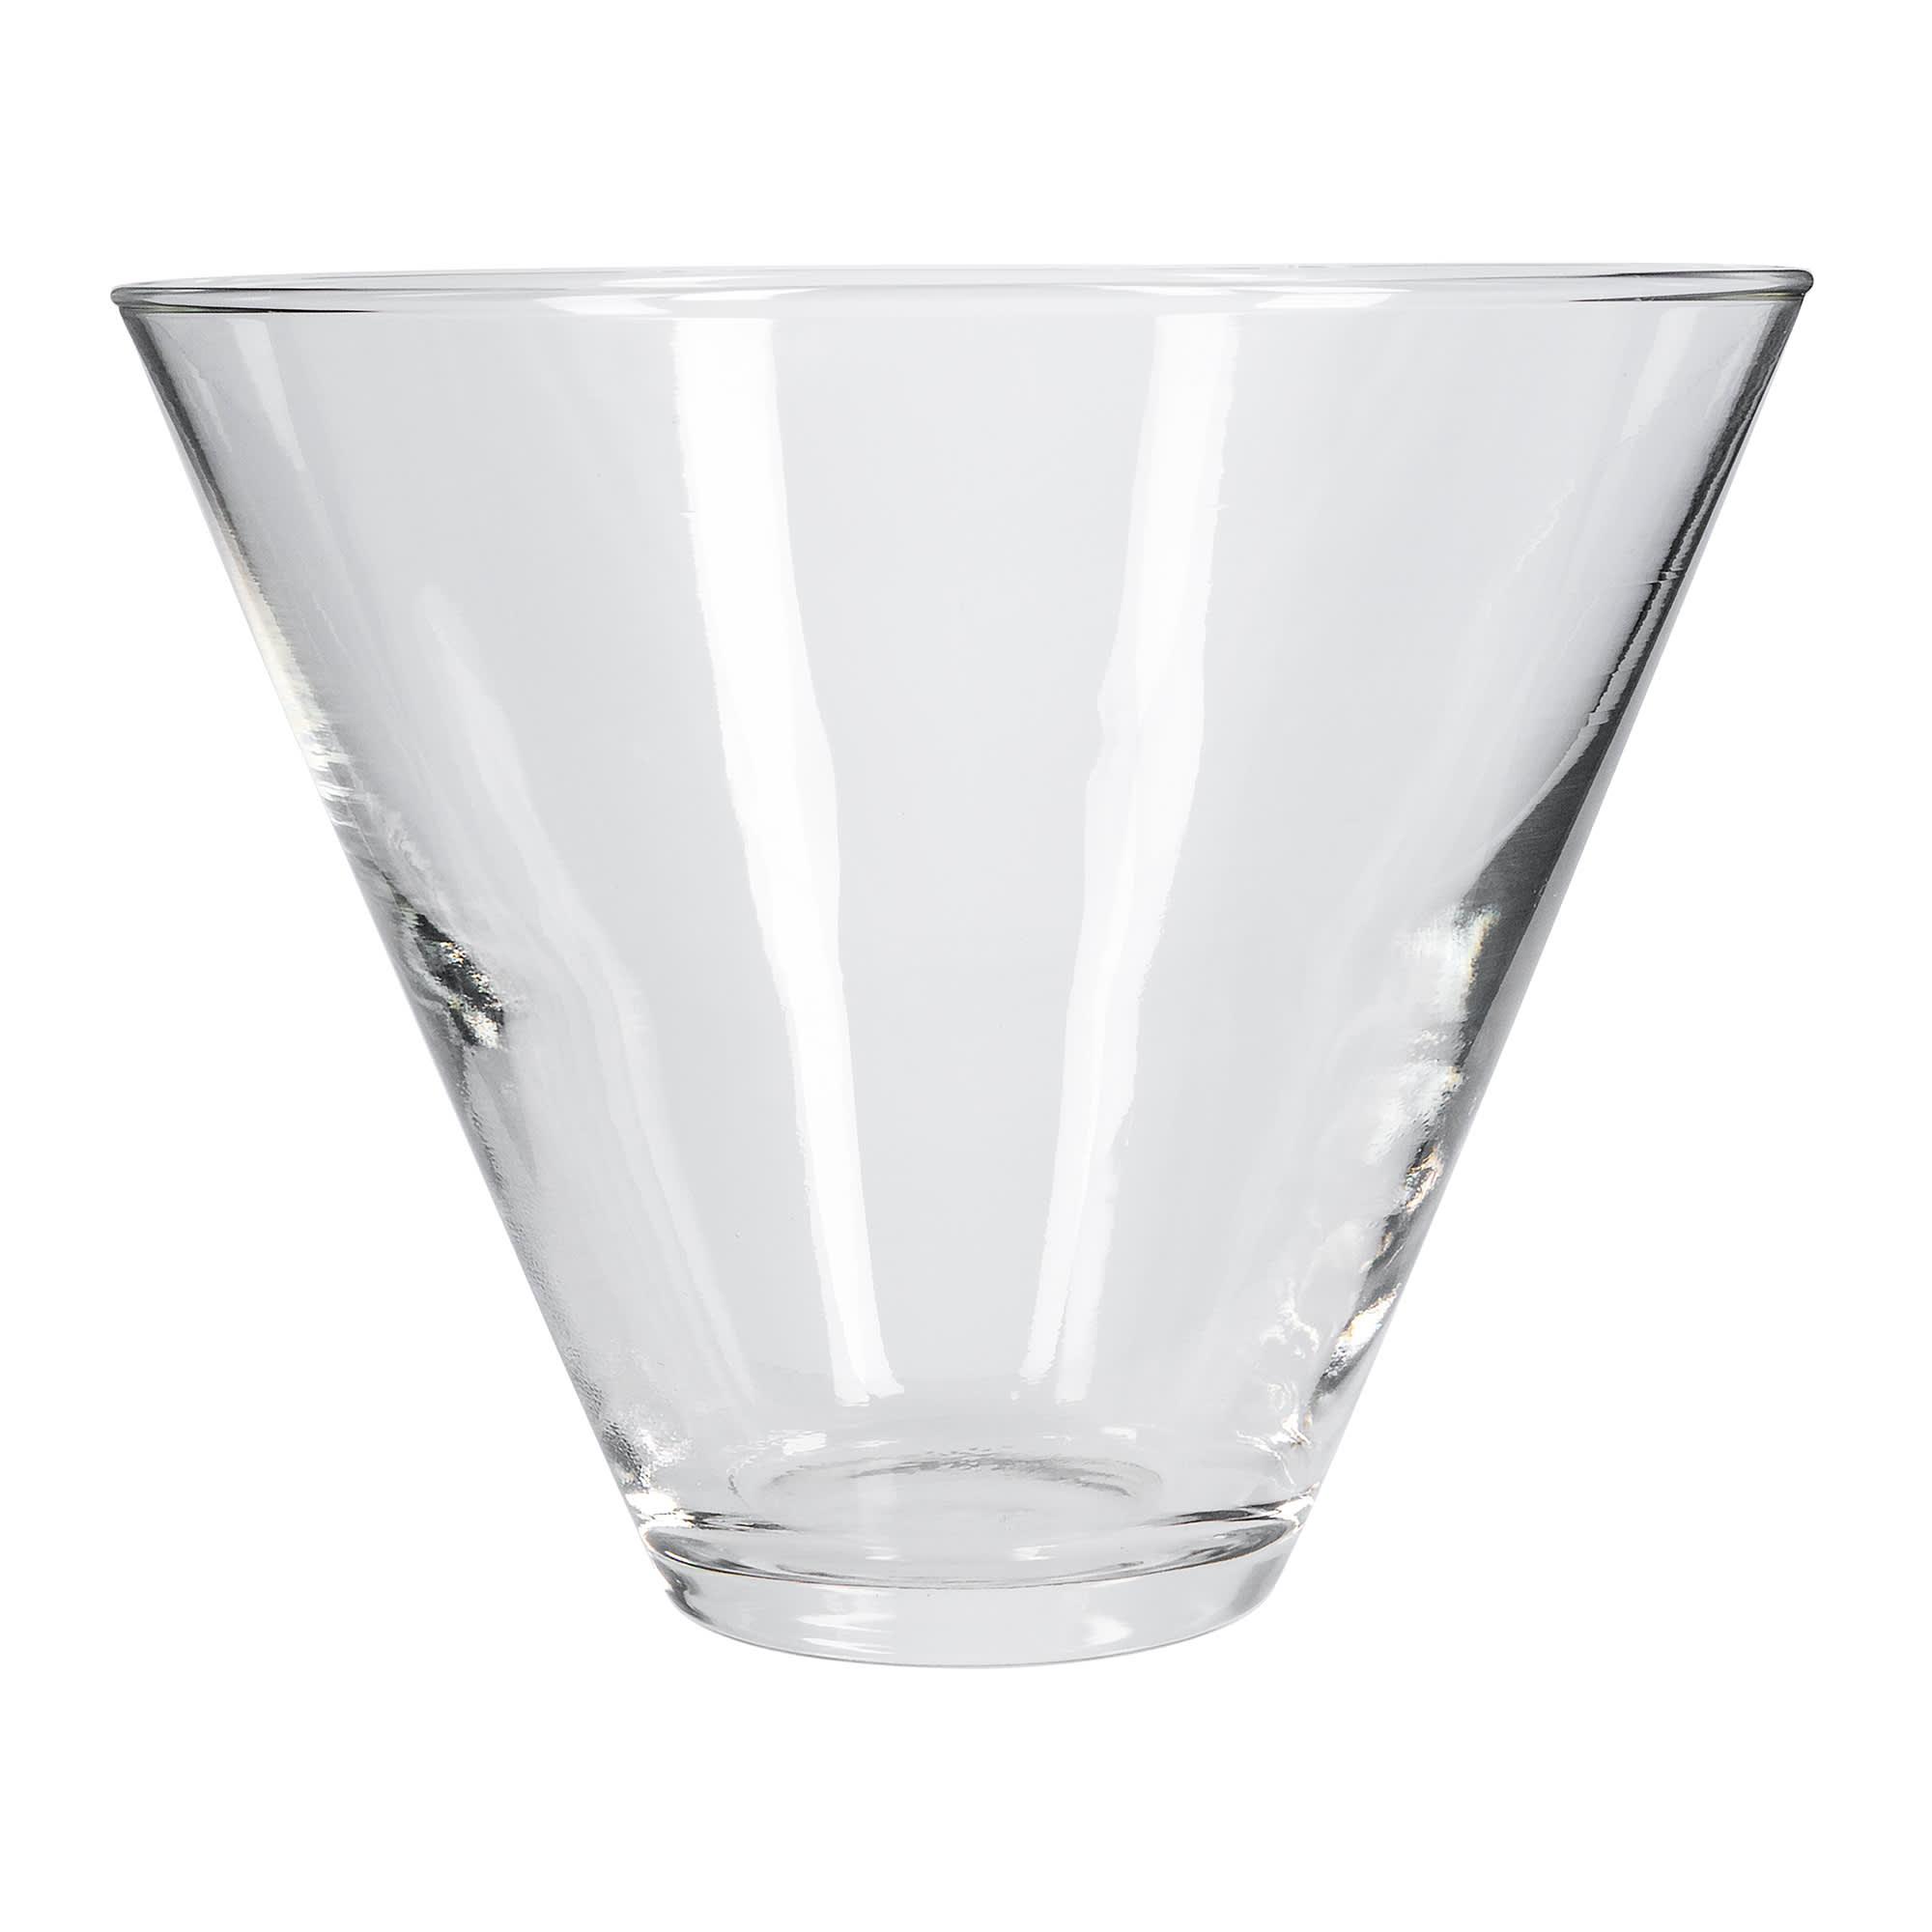 Libbey 224 13.5 oz Stemless Martini Glass